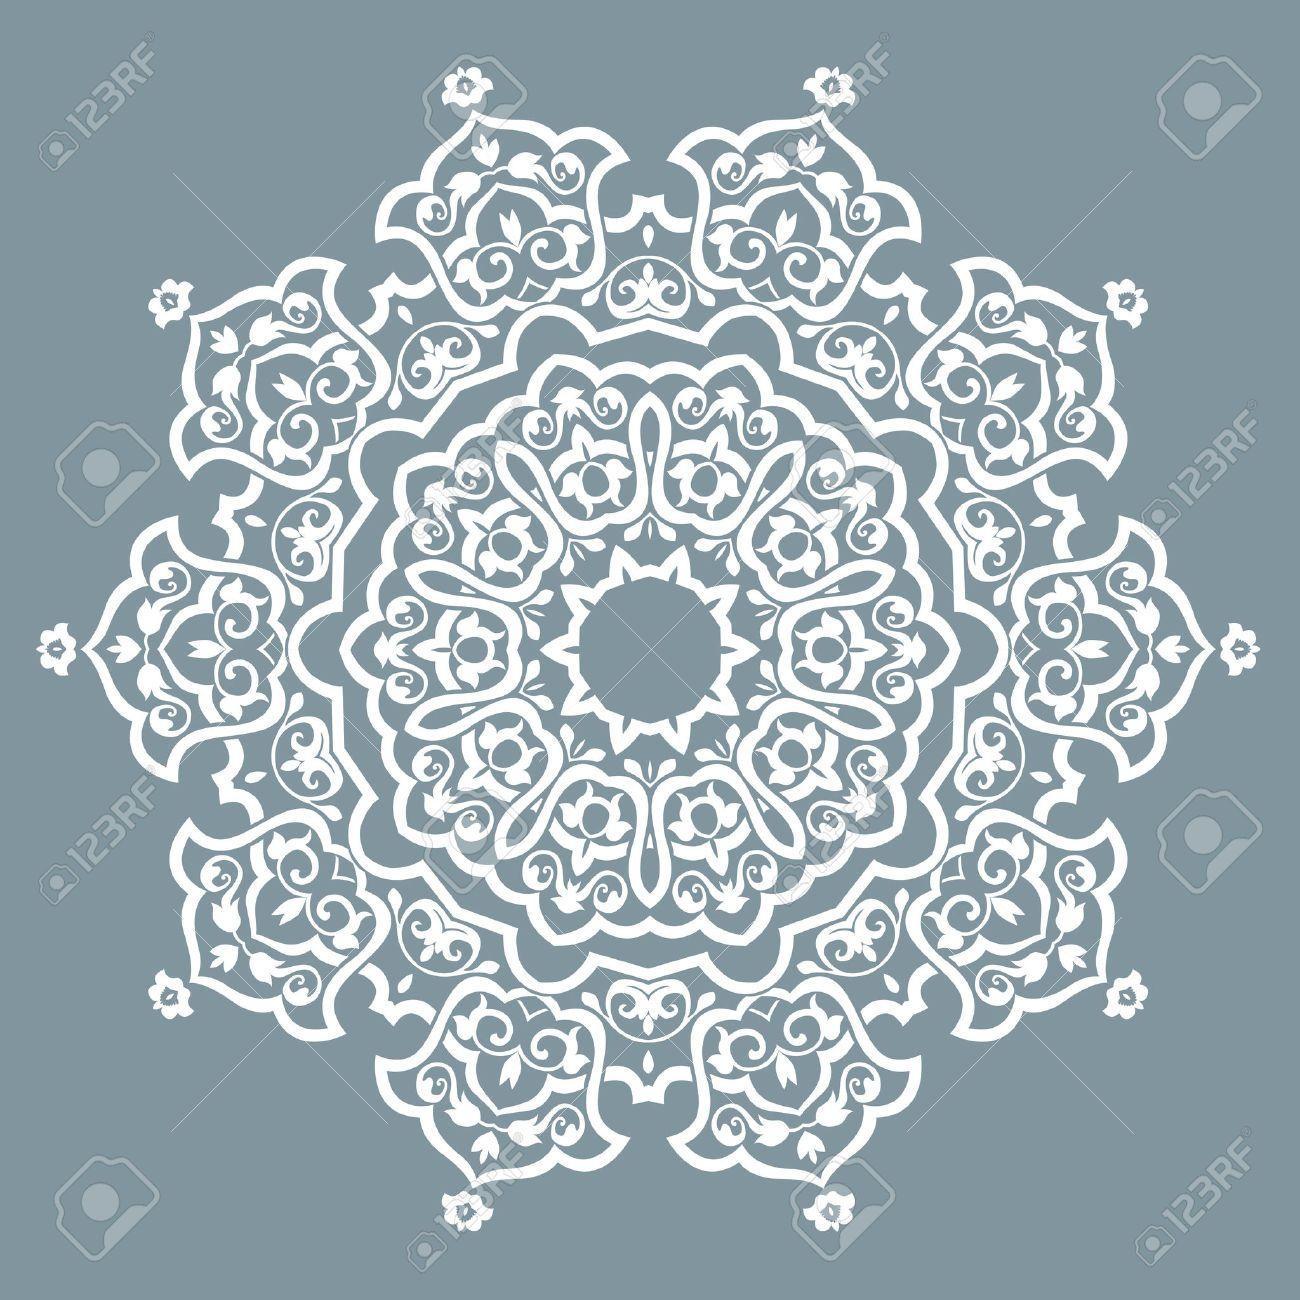 Turkish Design 35477623-round-pattern-mandala-abstract-design-of-persian-islamic